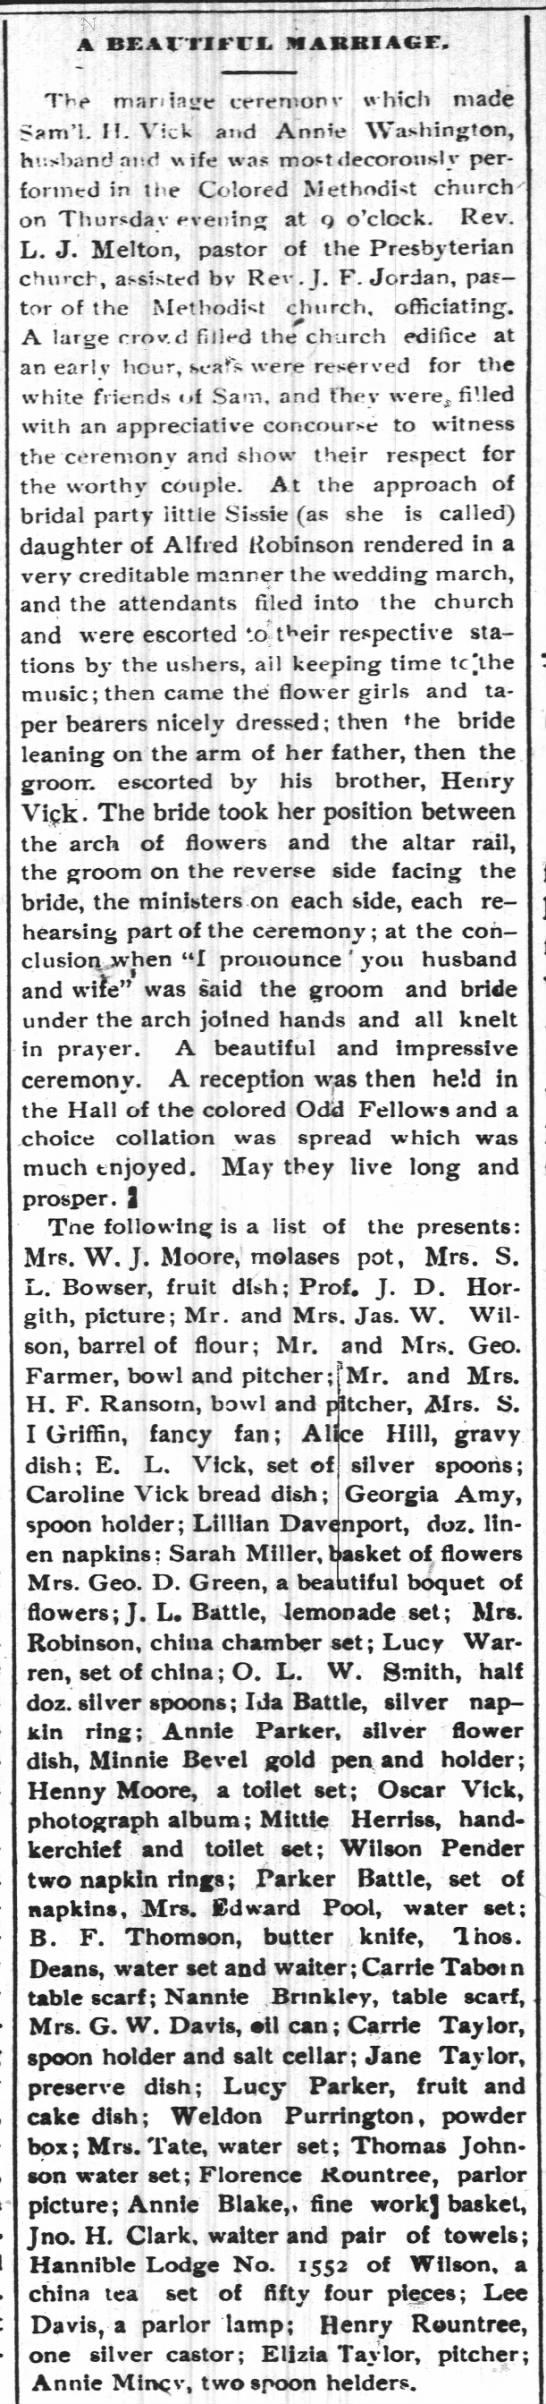 Wilson Mirror 6 1 1892 Vick Washington wedding